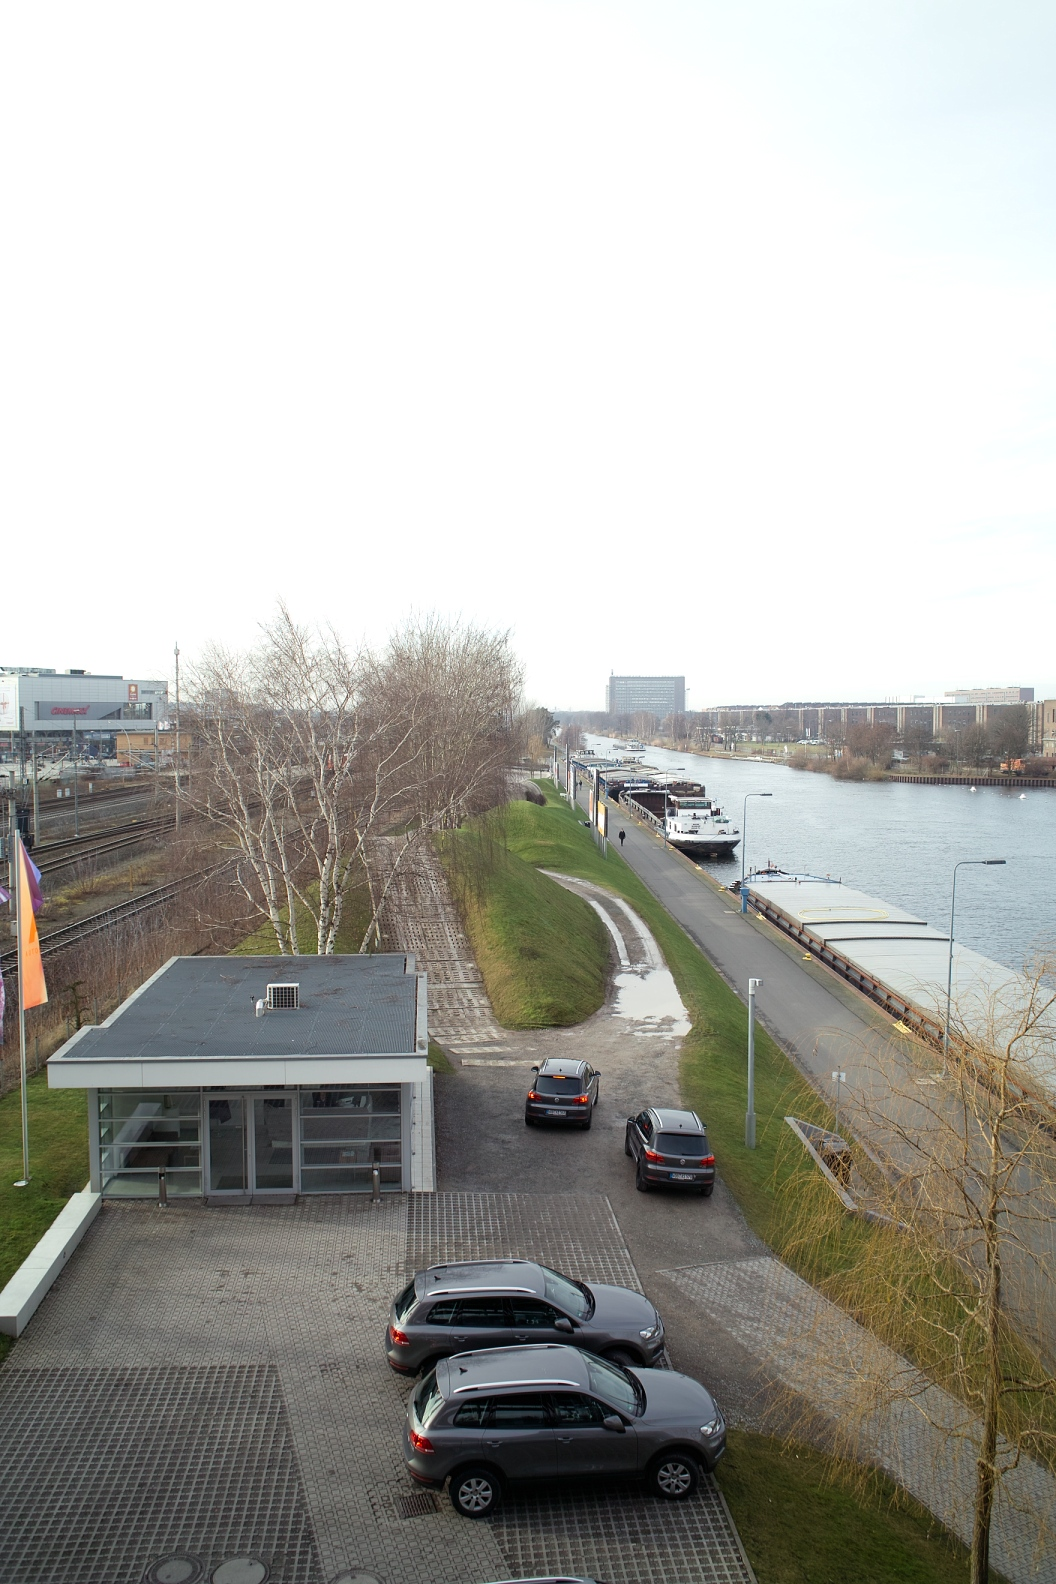 Halber Tag in Wolfsburg Autostadt 狼堡汽车城小游记